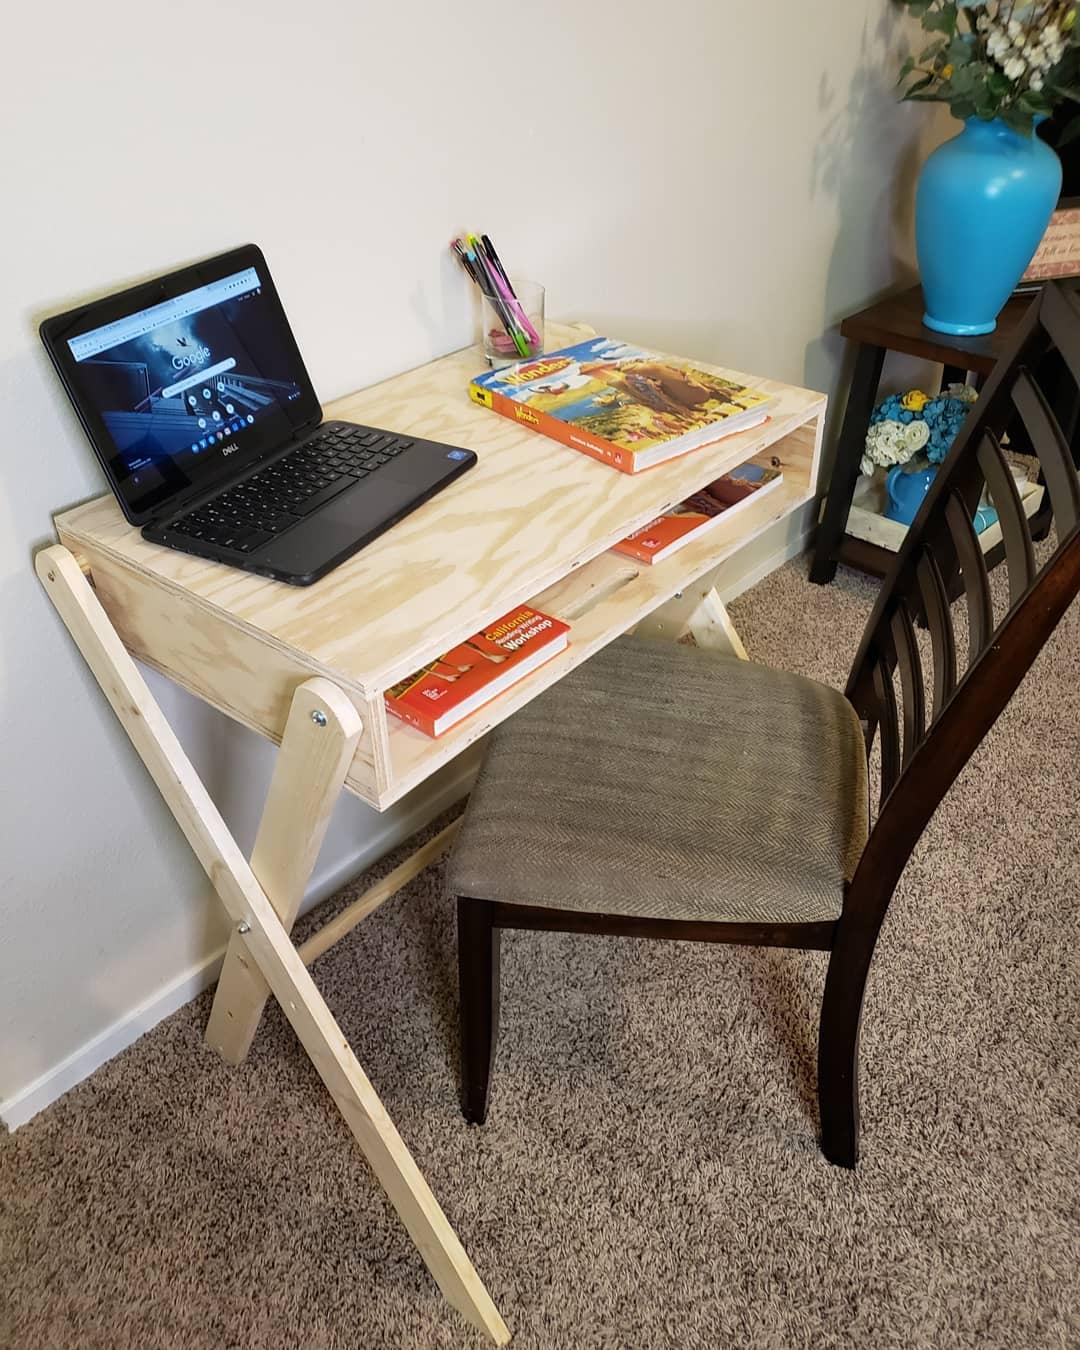 Good Samaritan Dad Building Desks for Virtual Students In Need